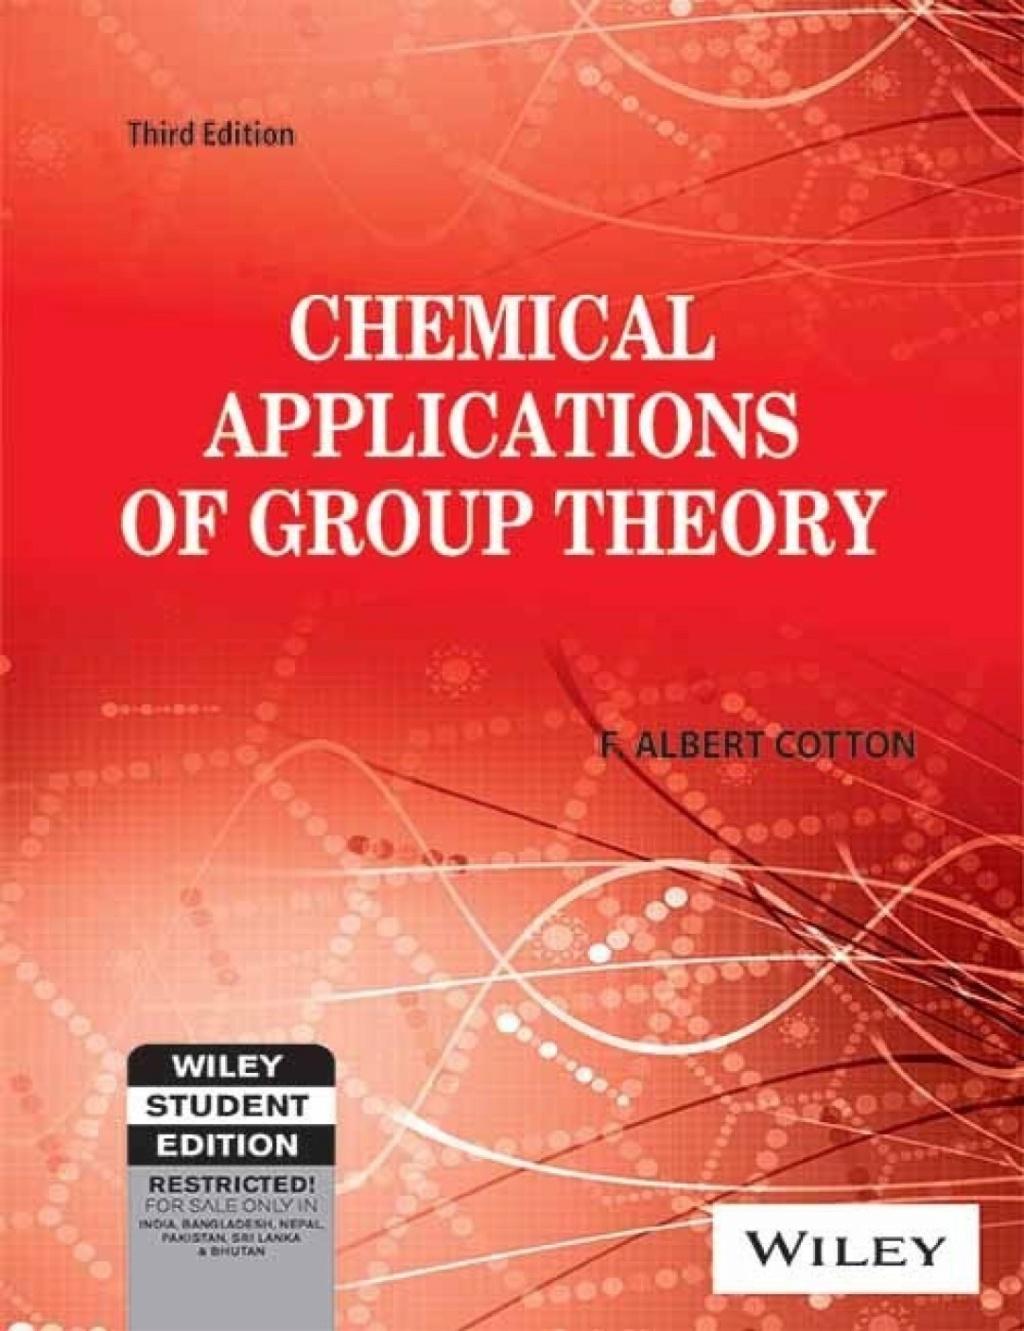 Group Theory Chemic10